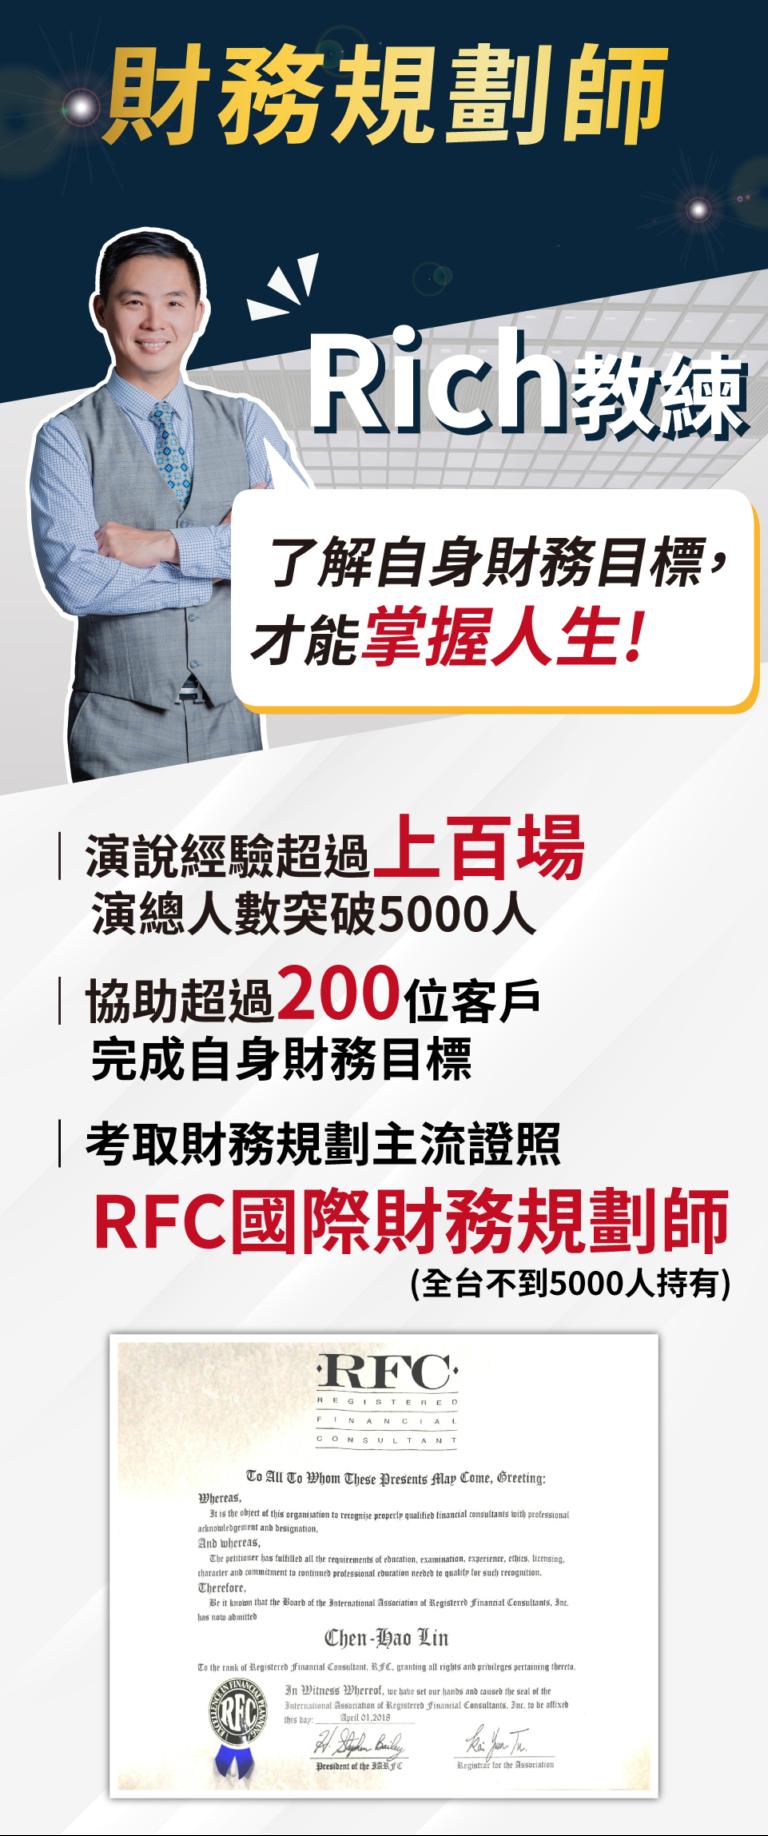 Rich教練-課程介紹